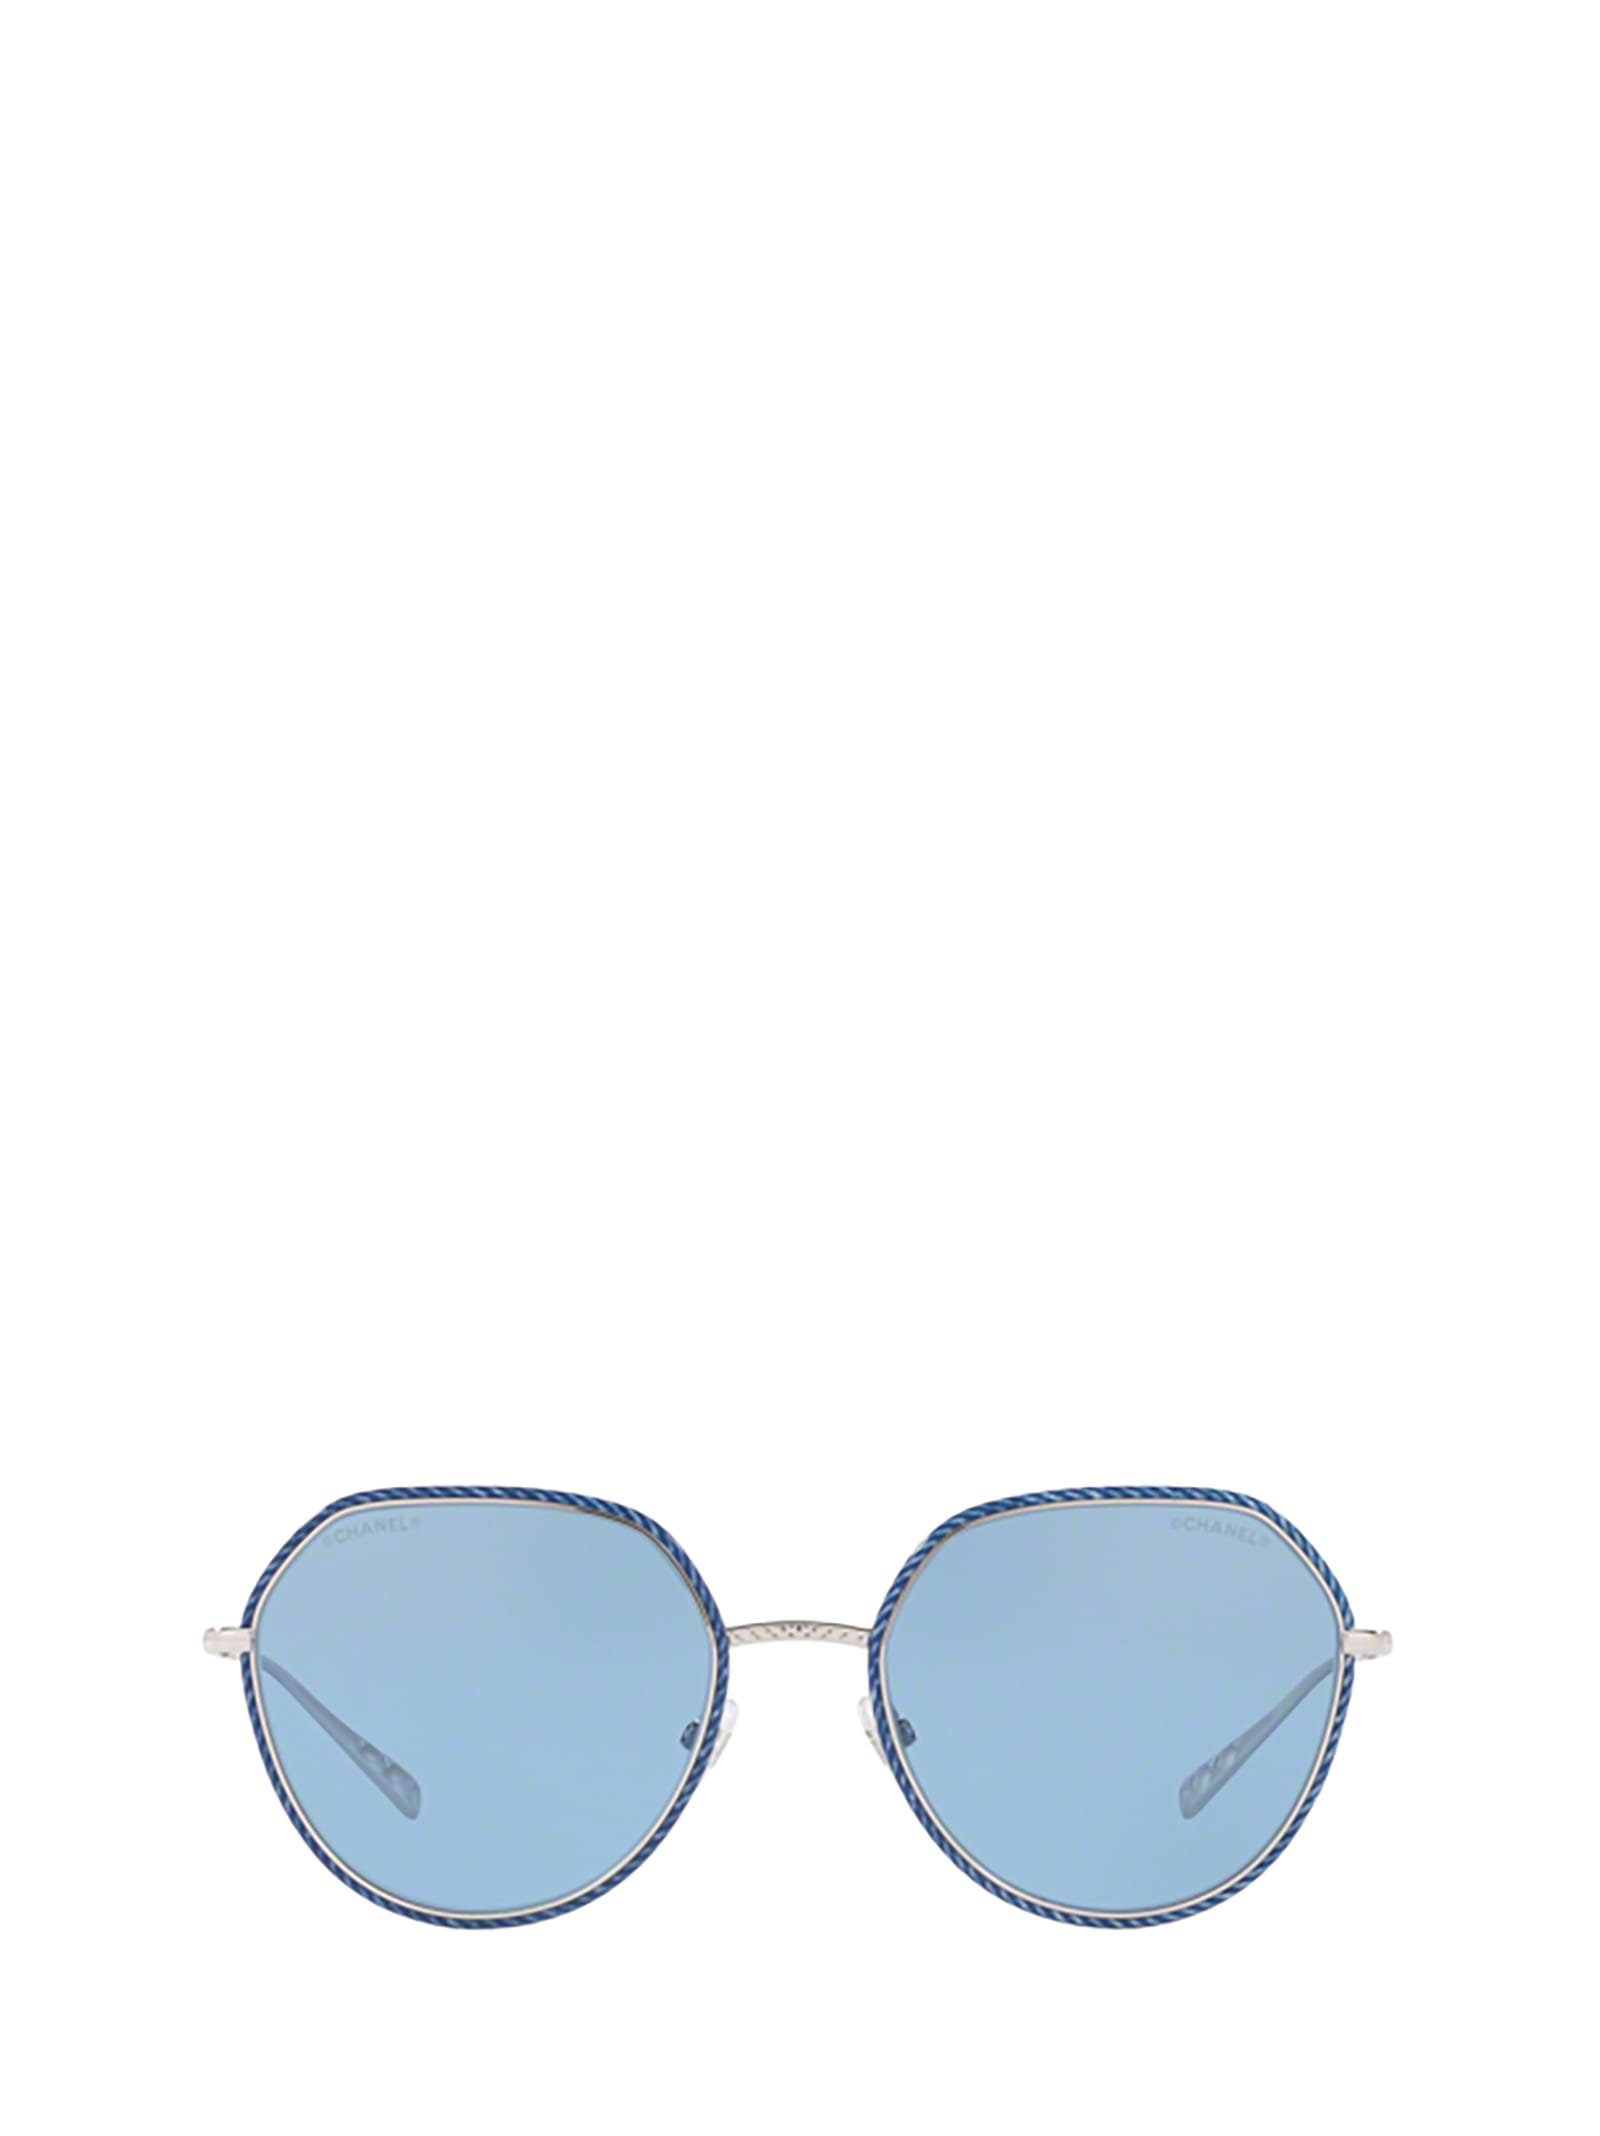 Chanel Chanel Ch4251j Jeans Sunglasses